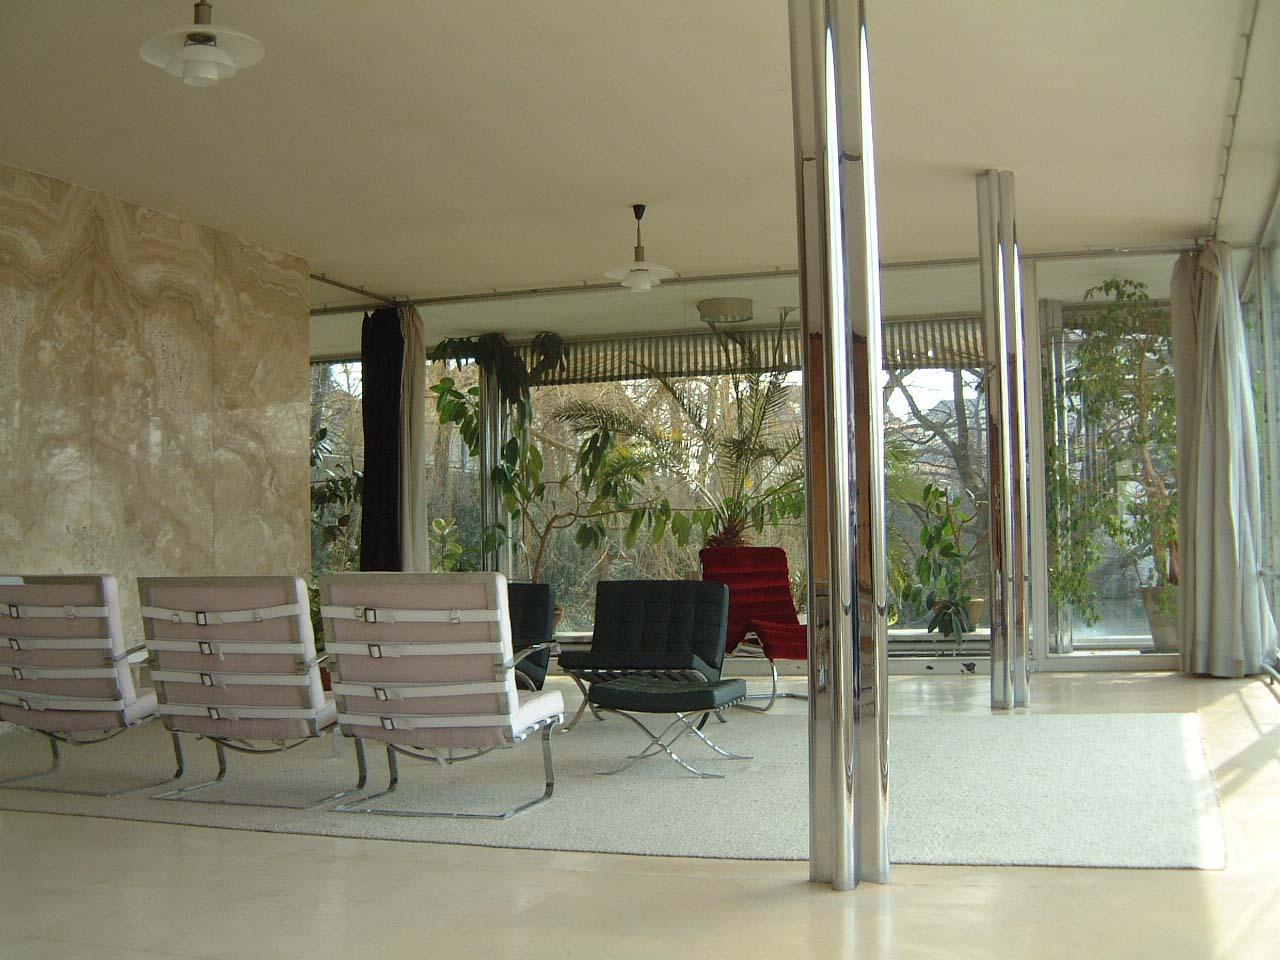 File:Tugendhat living room.jpg - Wikimedia Commons